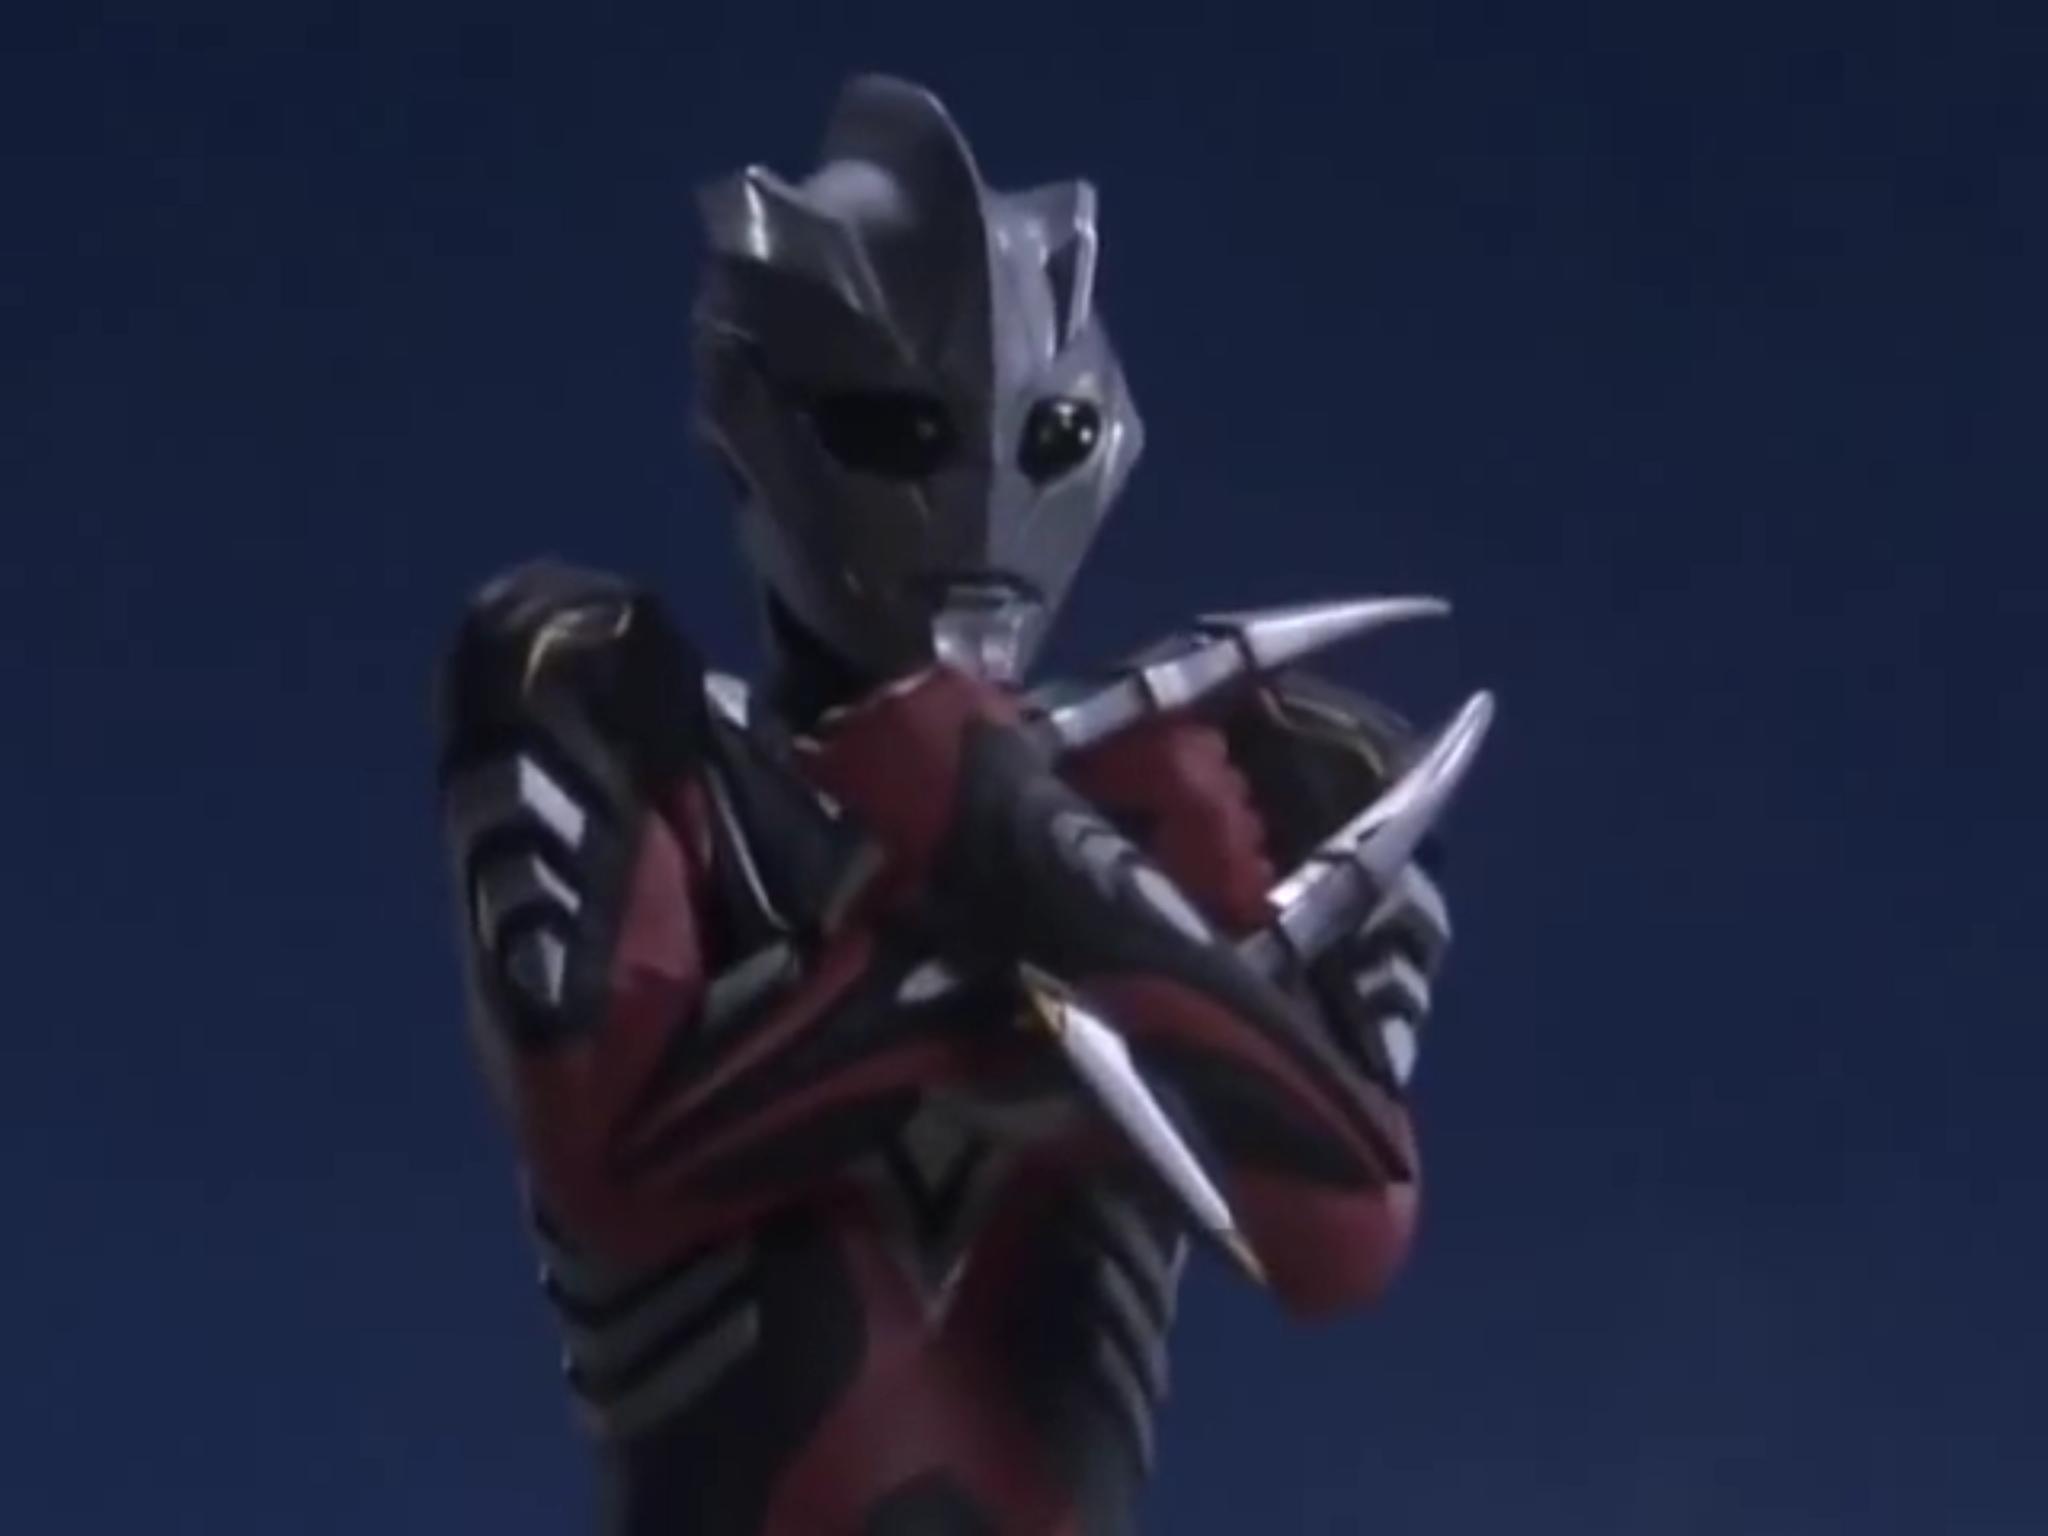 Armed Mephisto